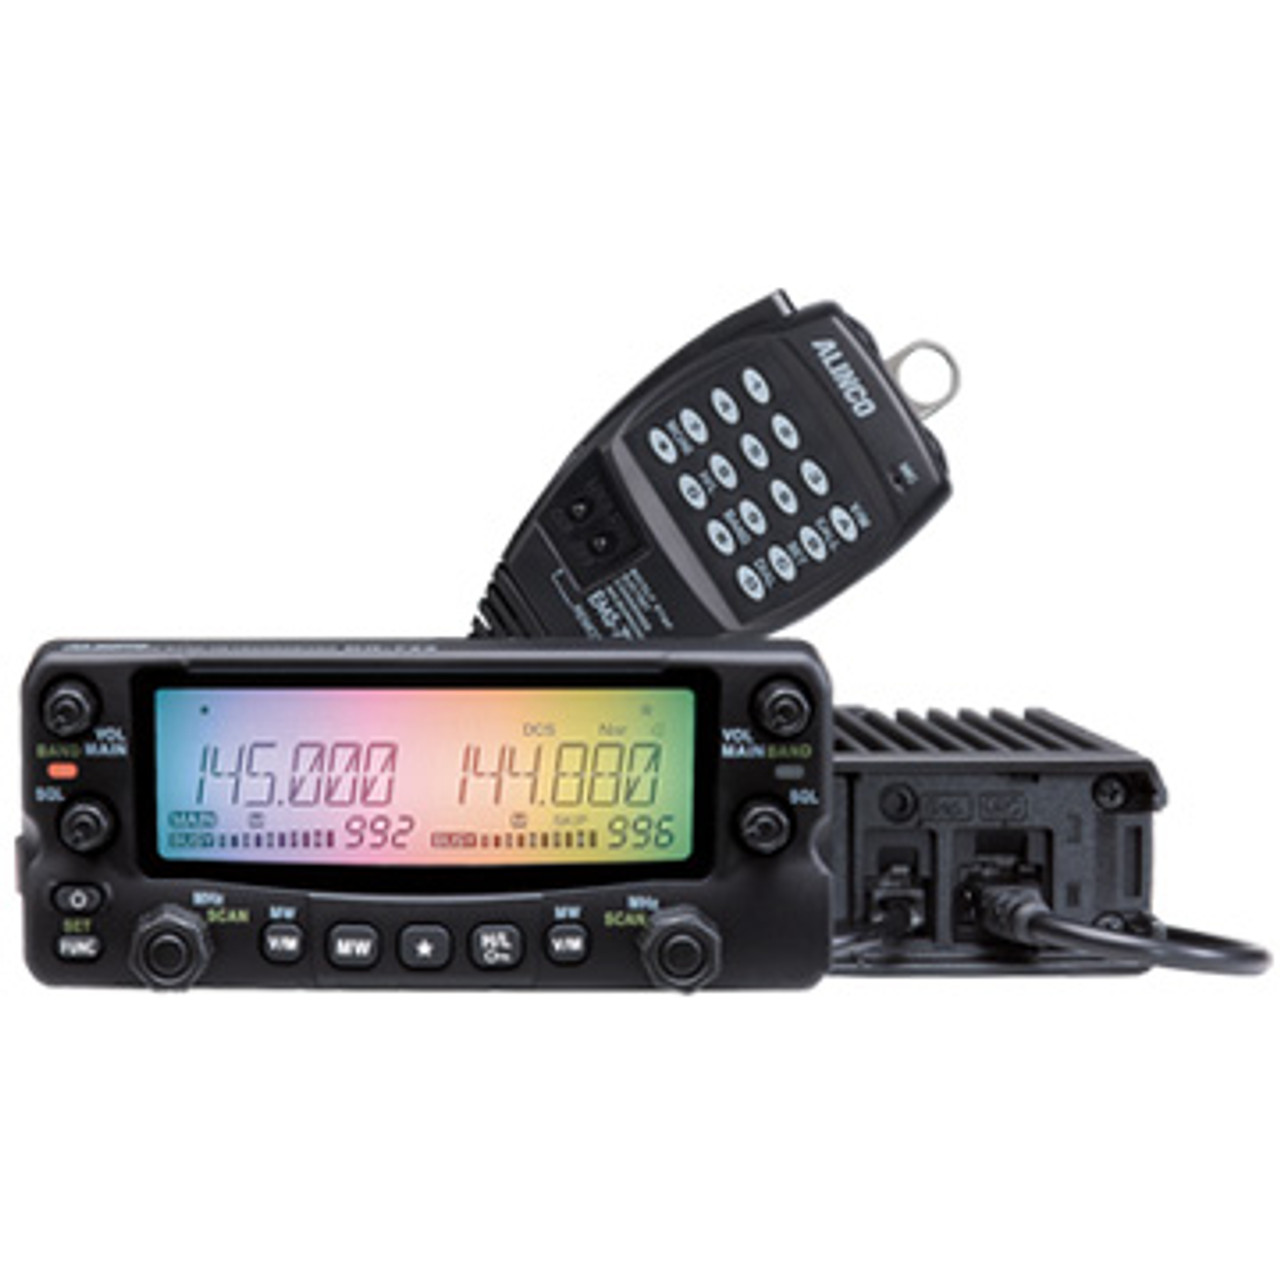 Alinco DR-735T Dual Band FM Mobile